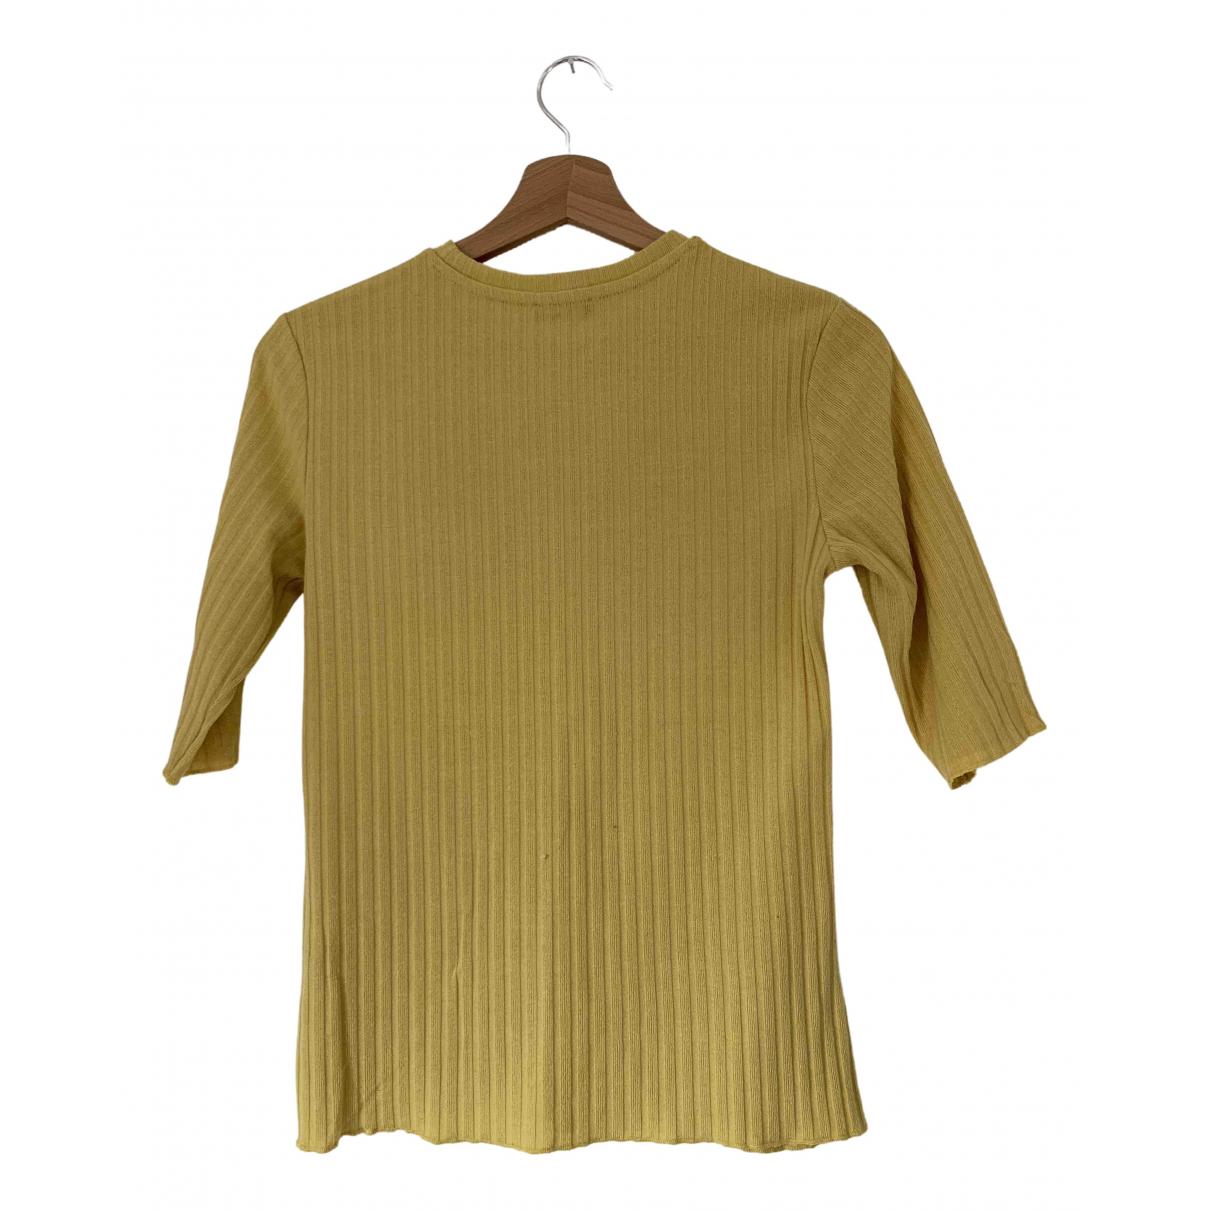 Zara - Top   pour femme - jaune